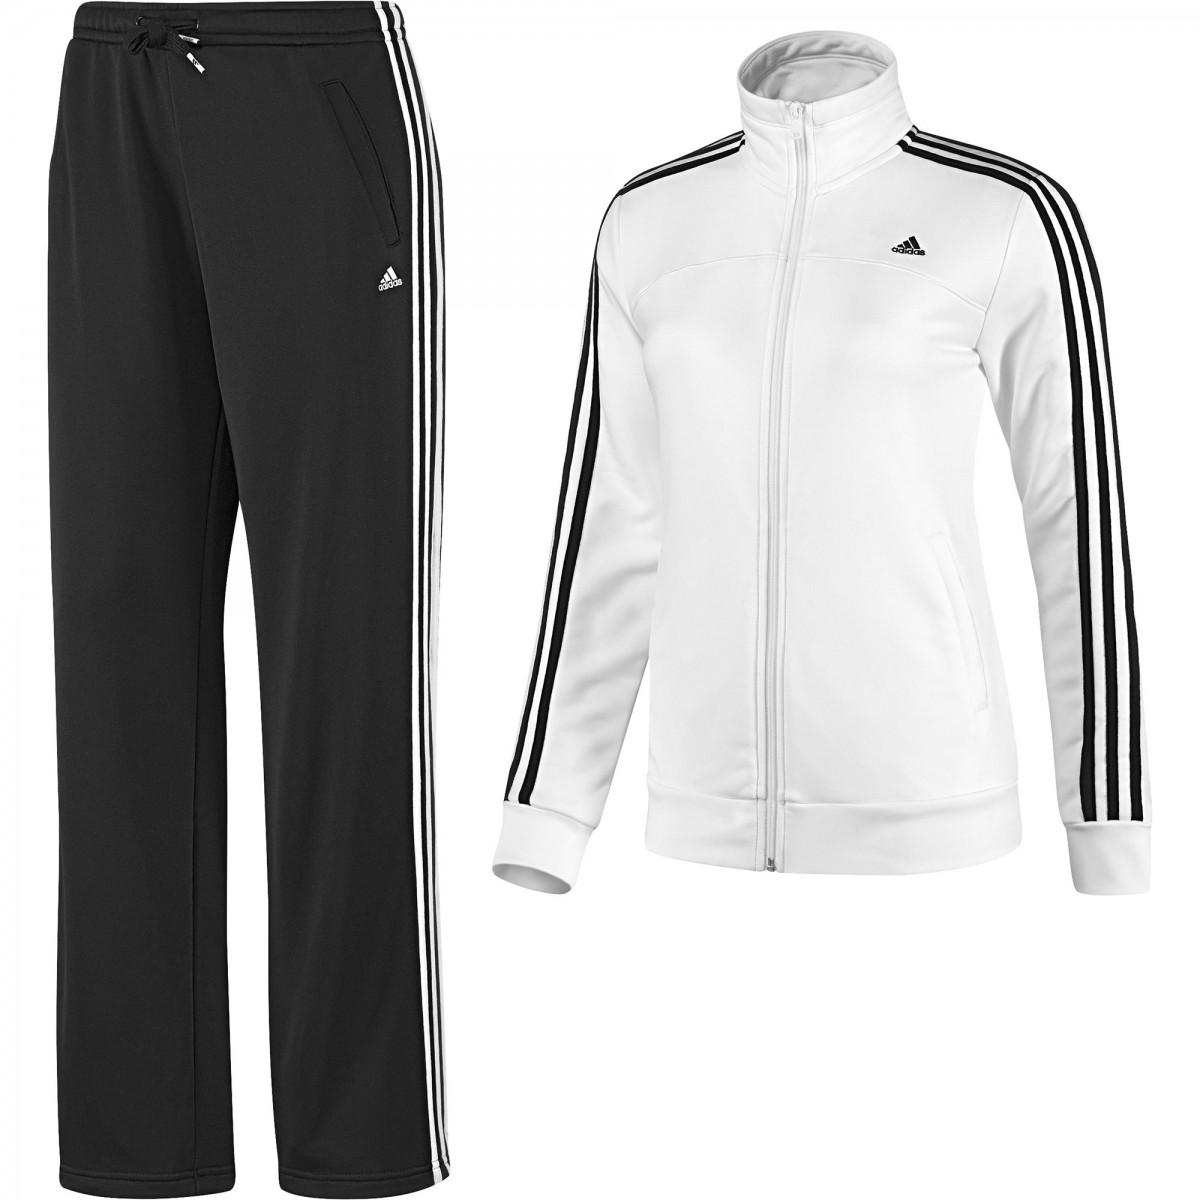 jaqueta adidas 3s wom feminina